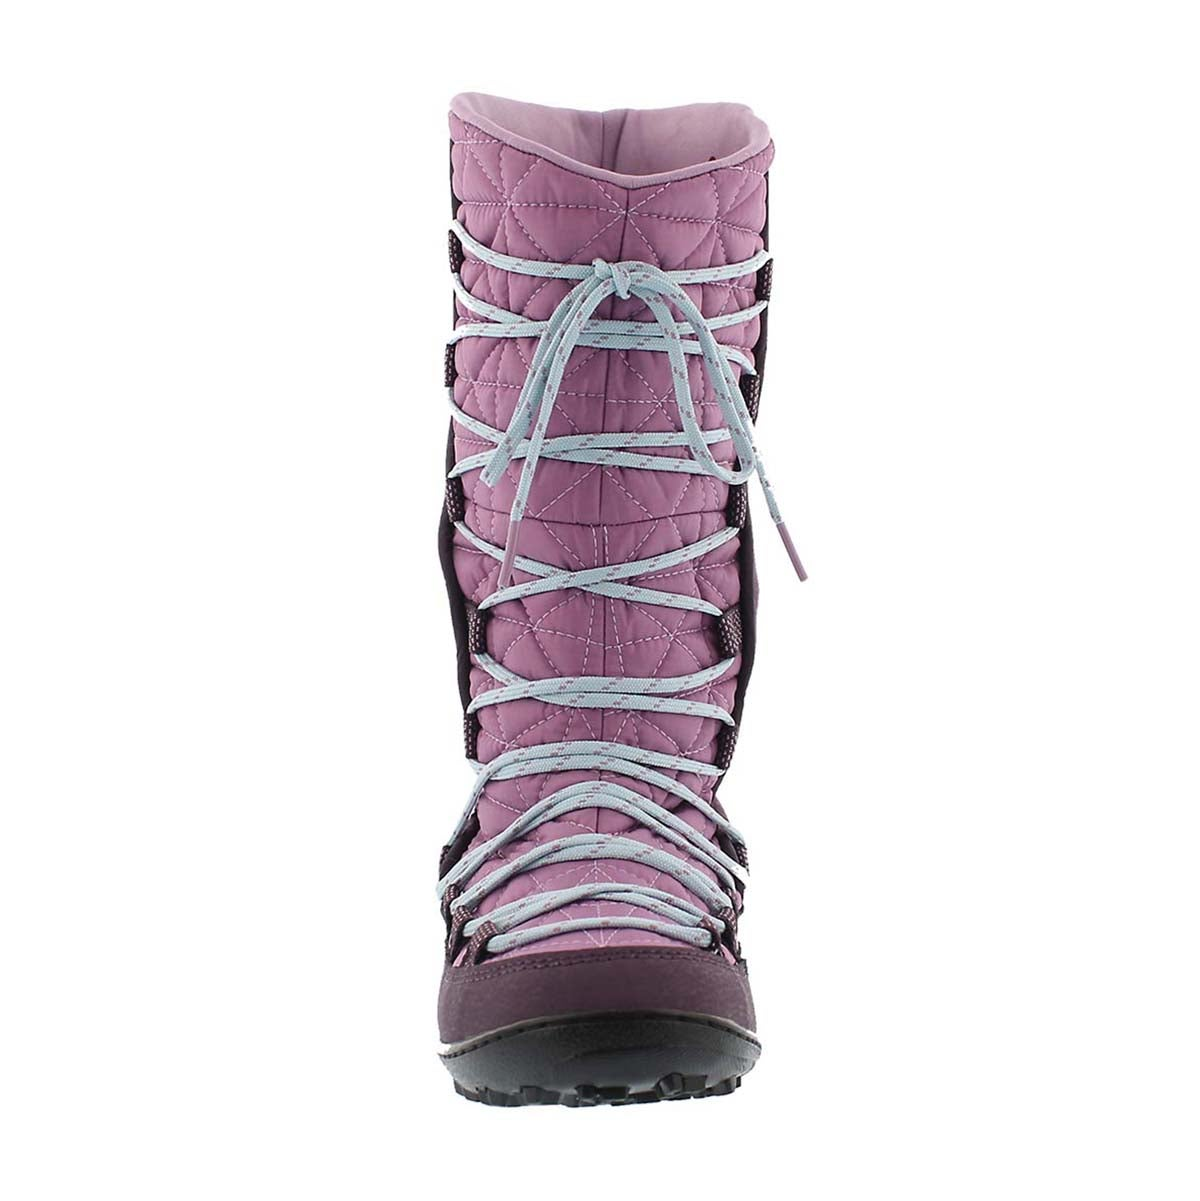 Grls Loveland OmniHeat violet tall boot